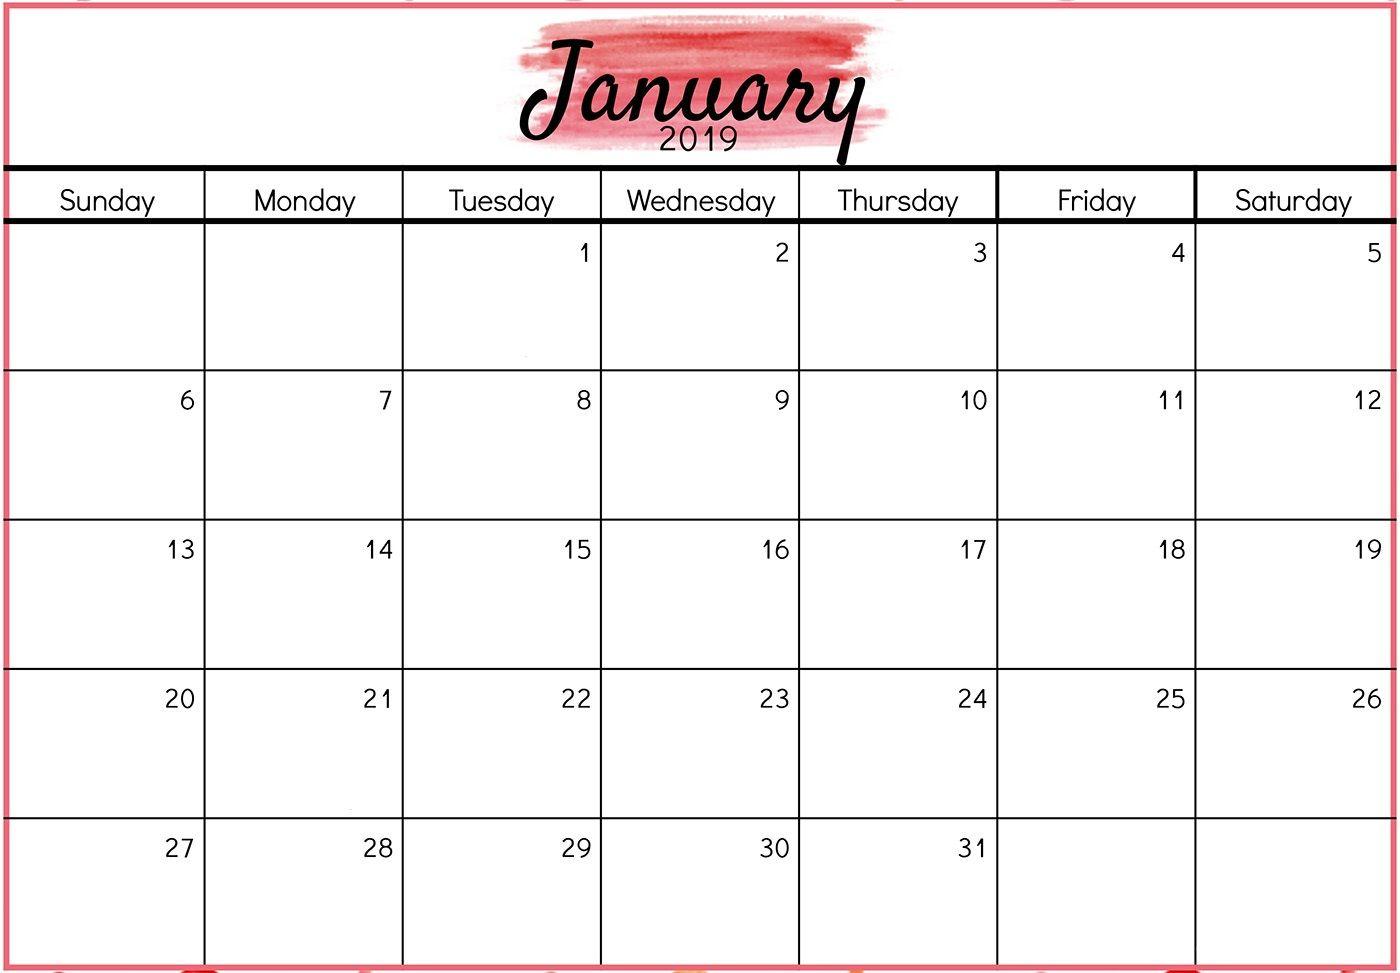 Printable January 2019 Calendar Design   Free Printable February in Decorative Printable Calendar Templates